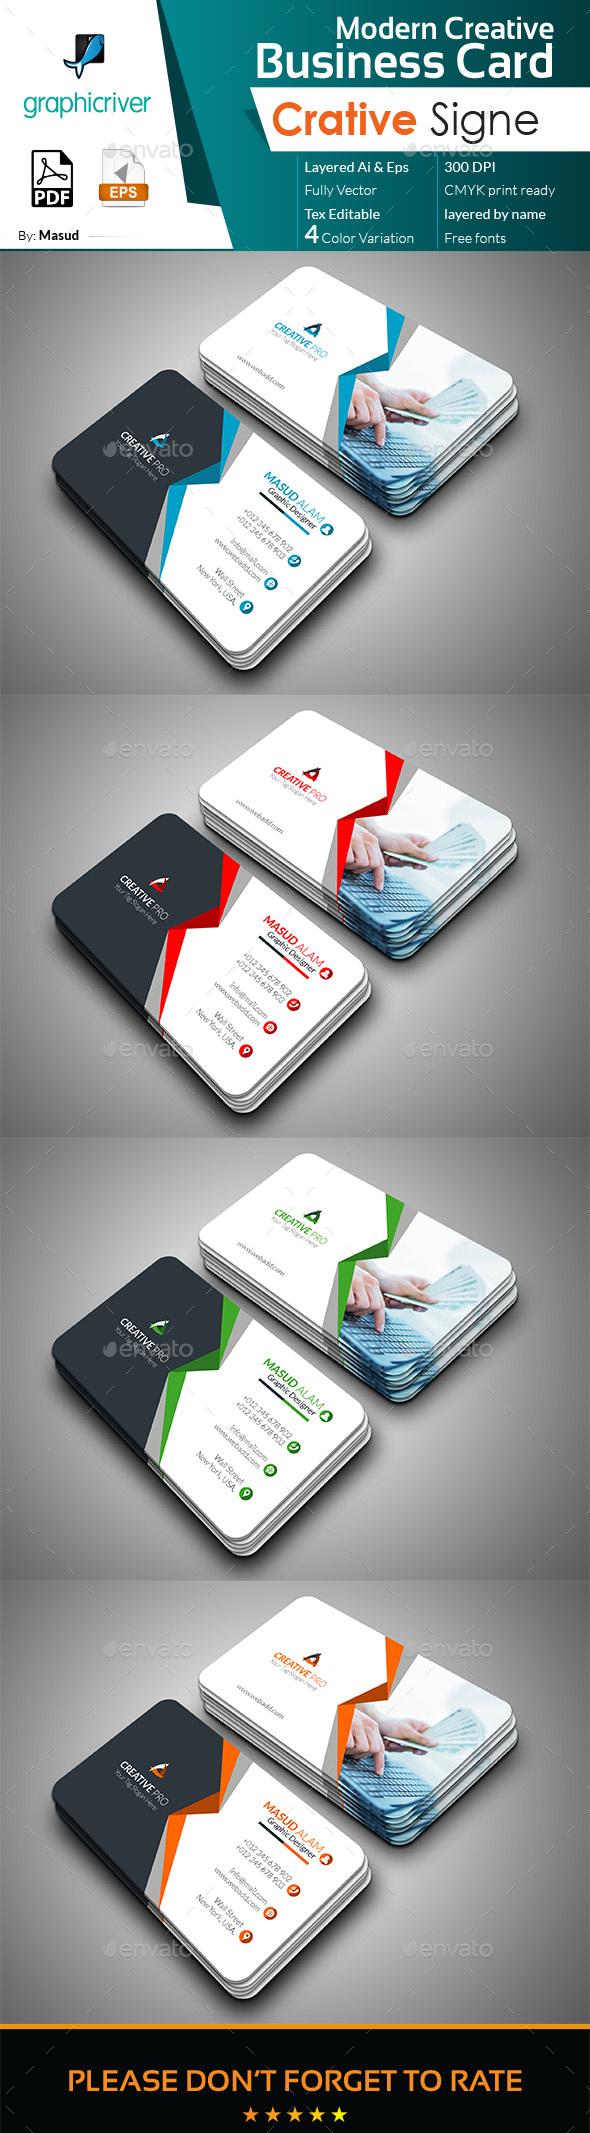 Modern Business Card PSD Templates 30 Print Ready Design